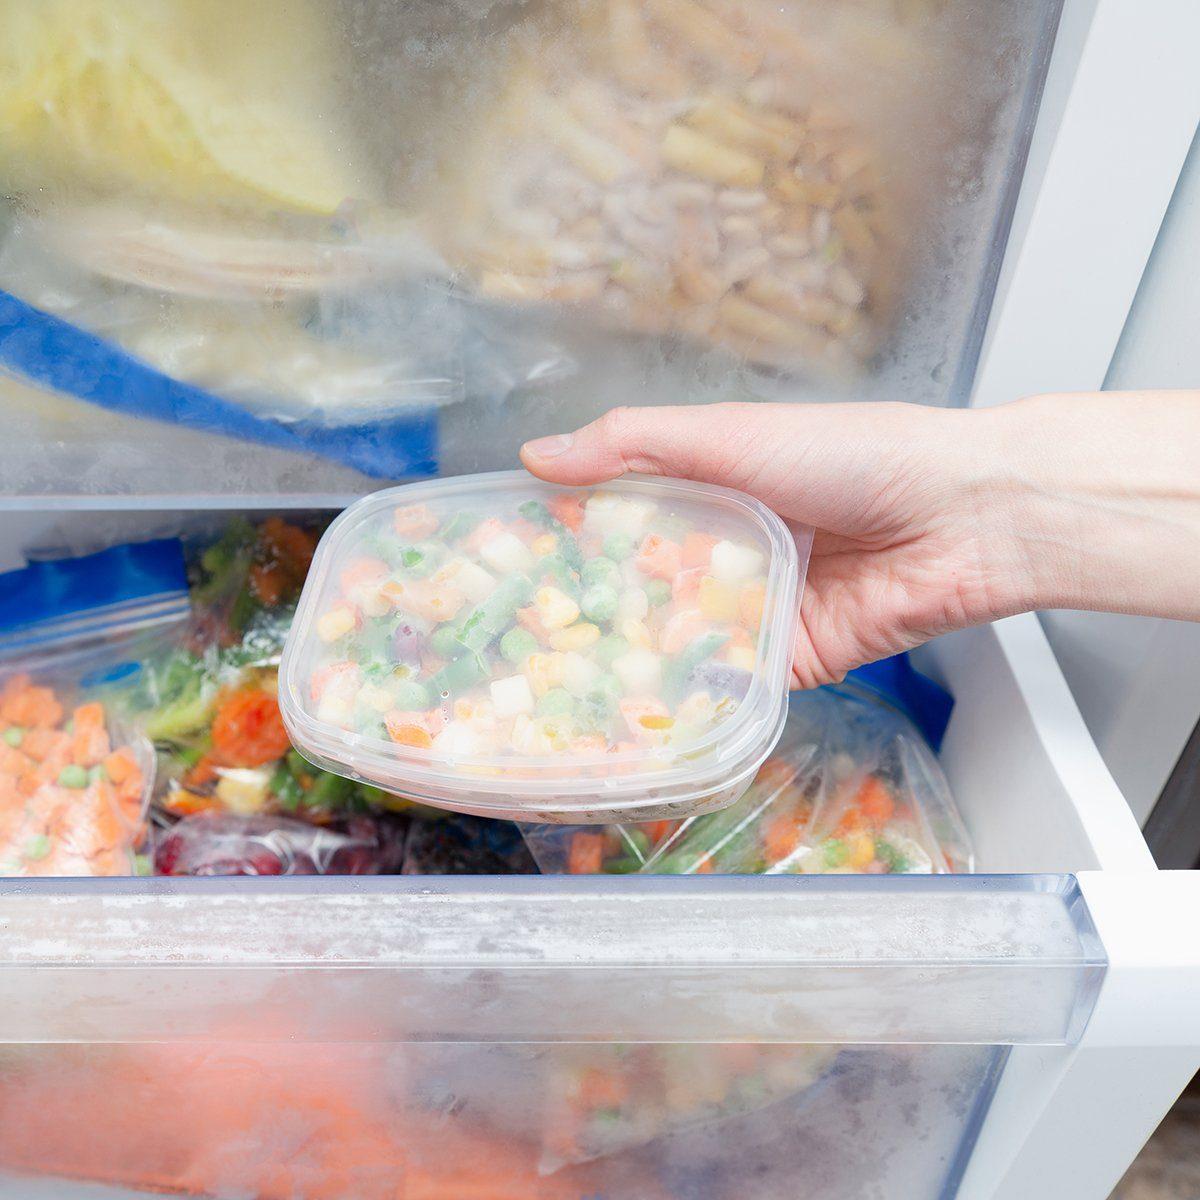 Frozen vegetables in a plastic bag. Healthy food storage concept.